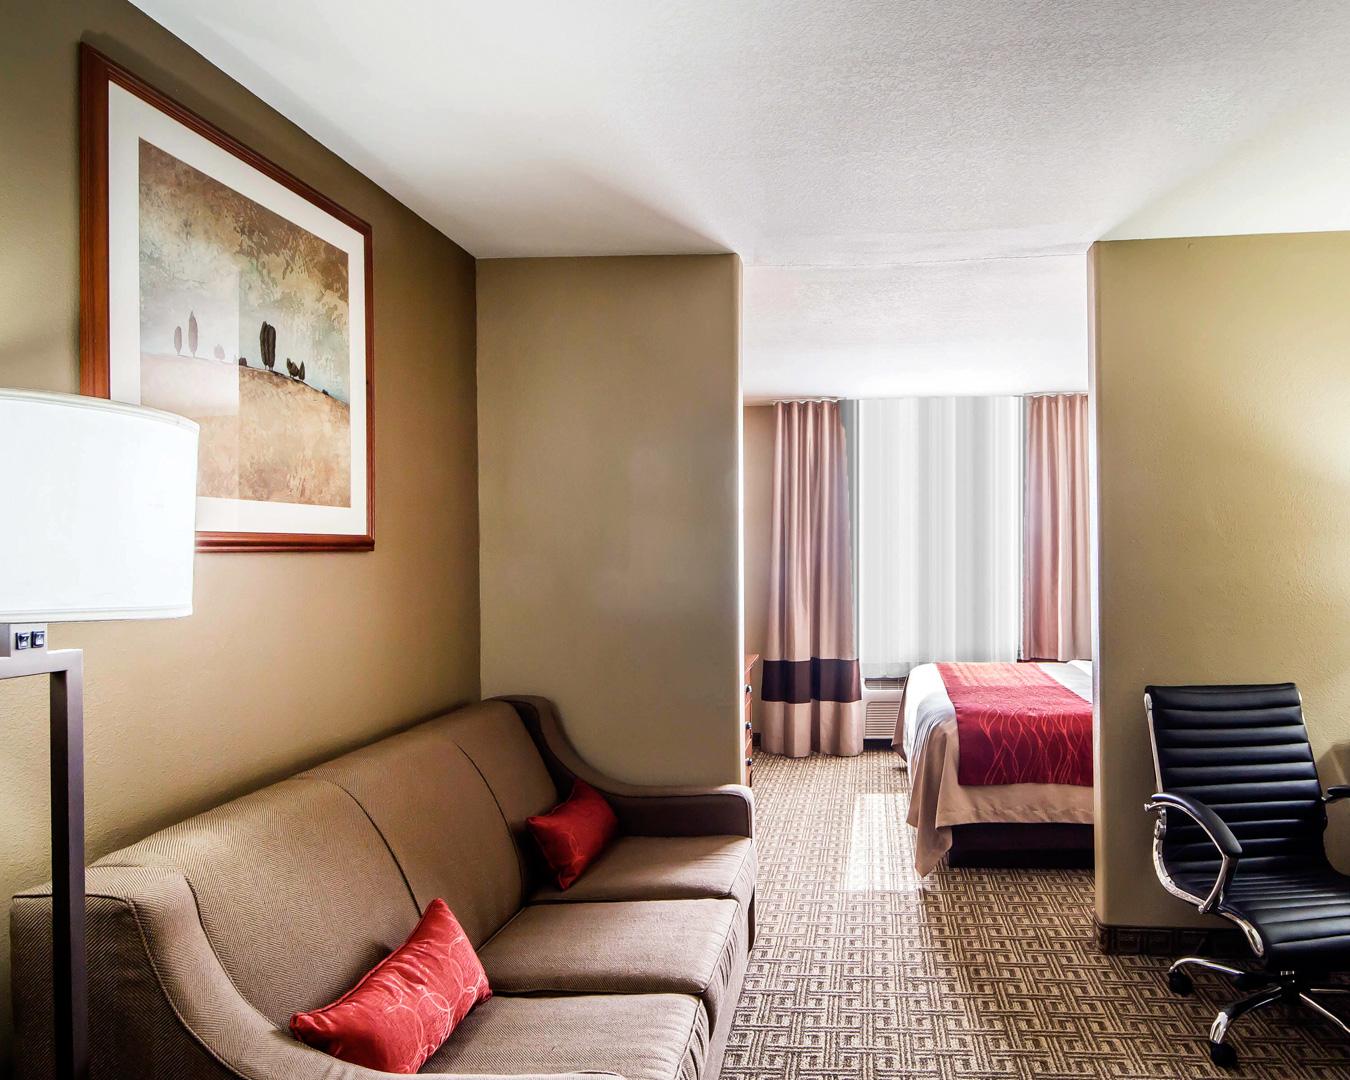 Comfort Inn & Suites, Ponca City OK